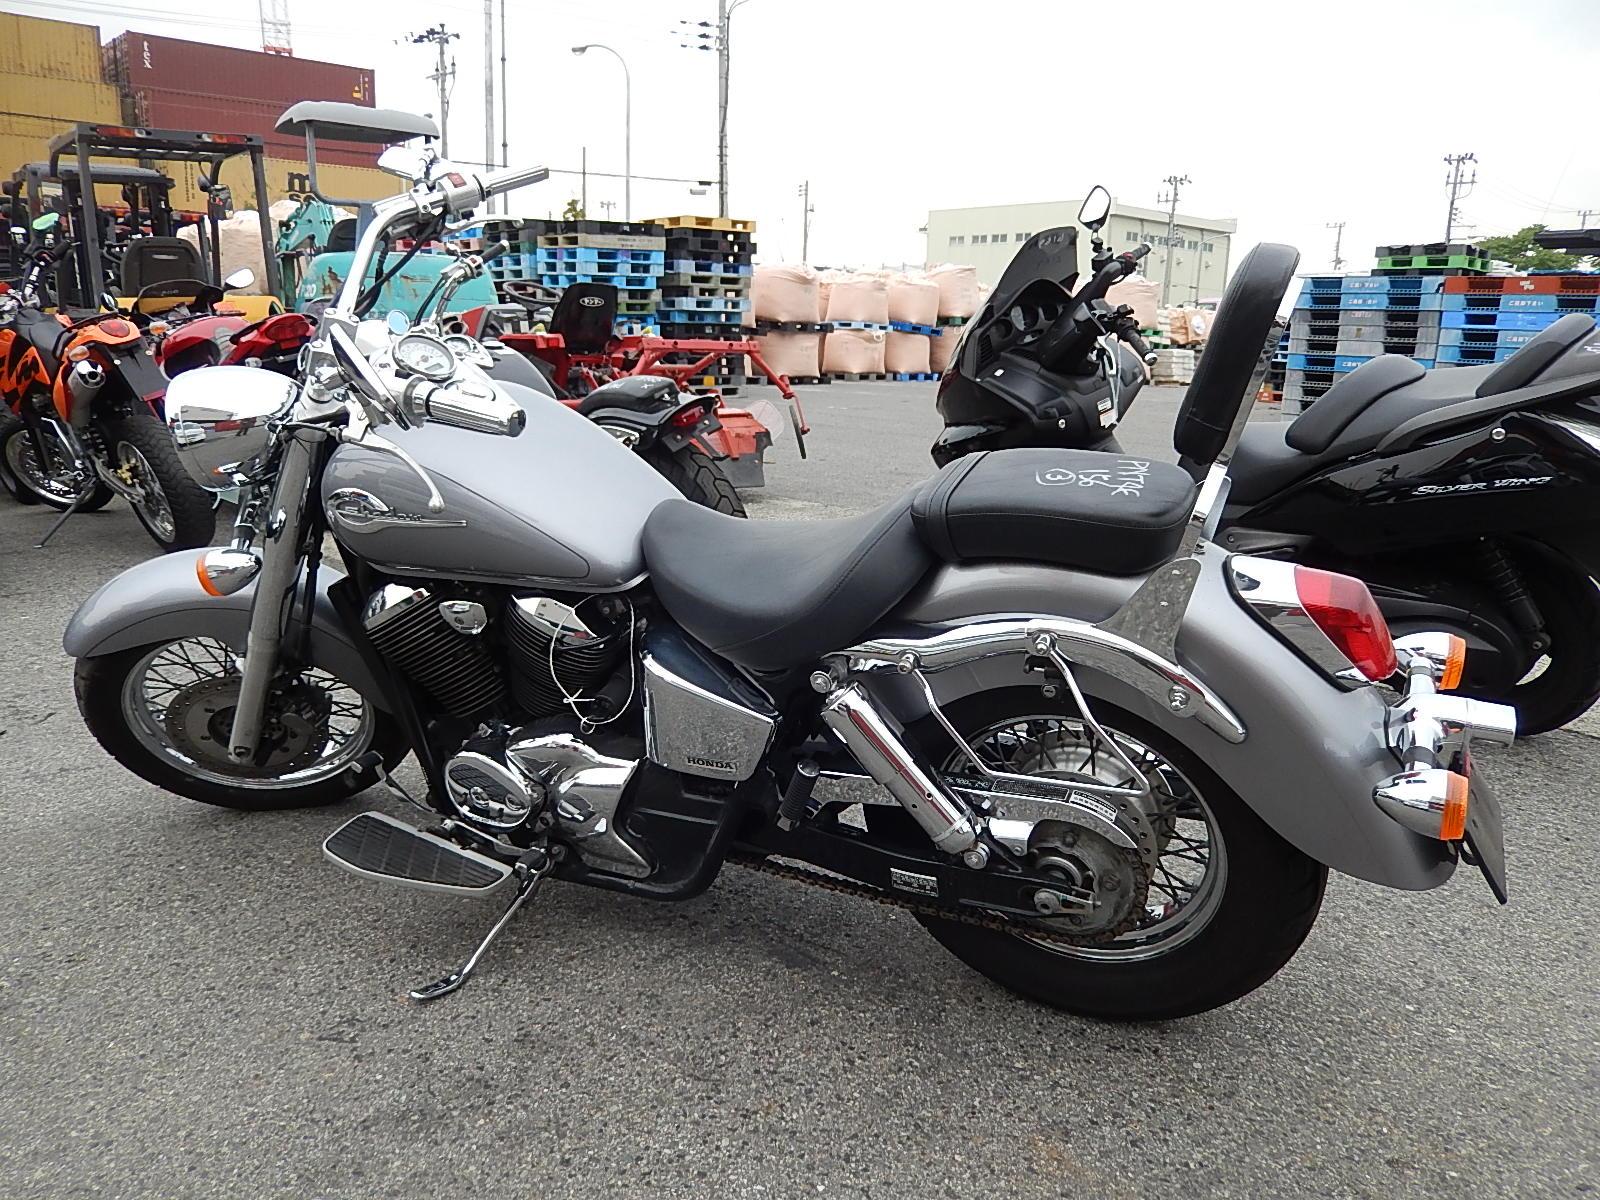 Обзор мотоцикла Honda Shadow 400